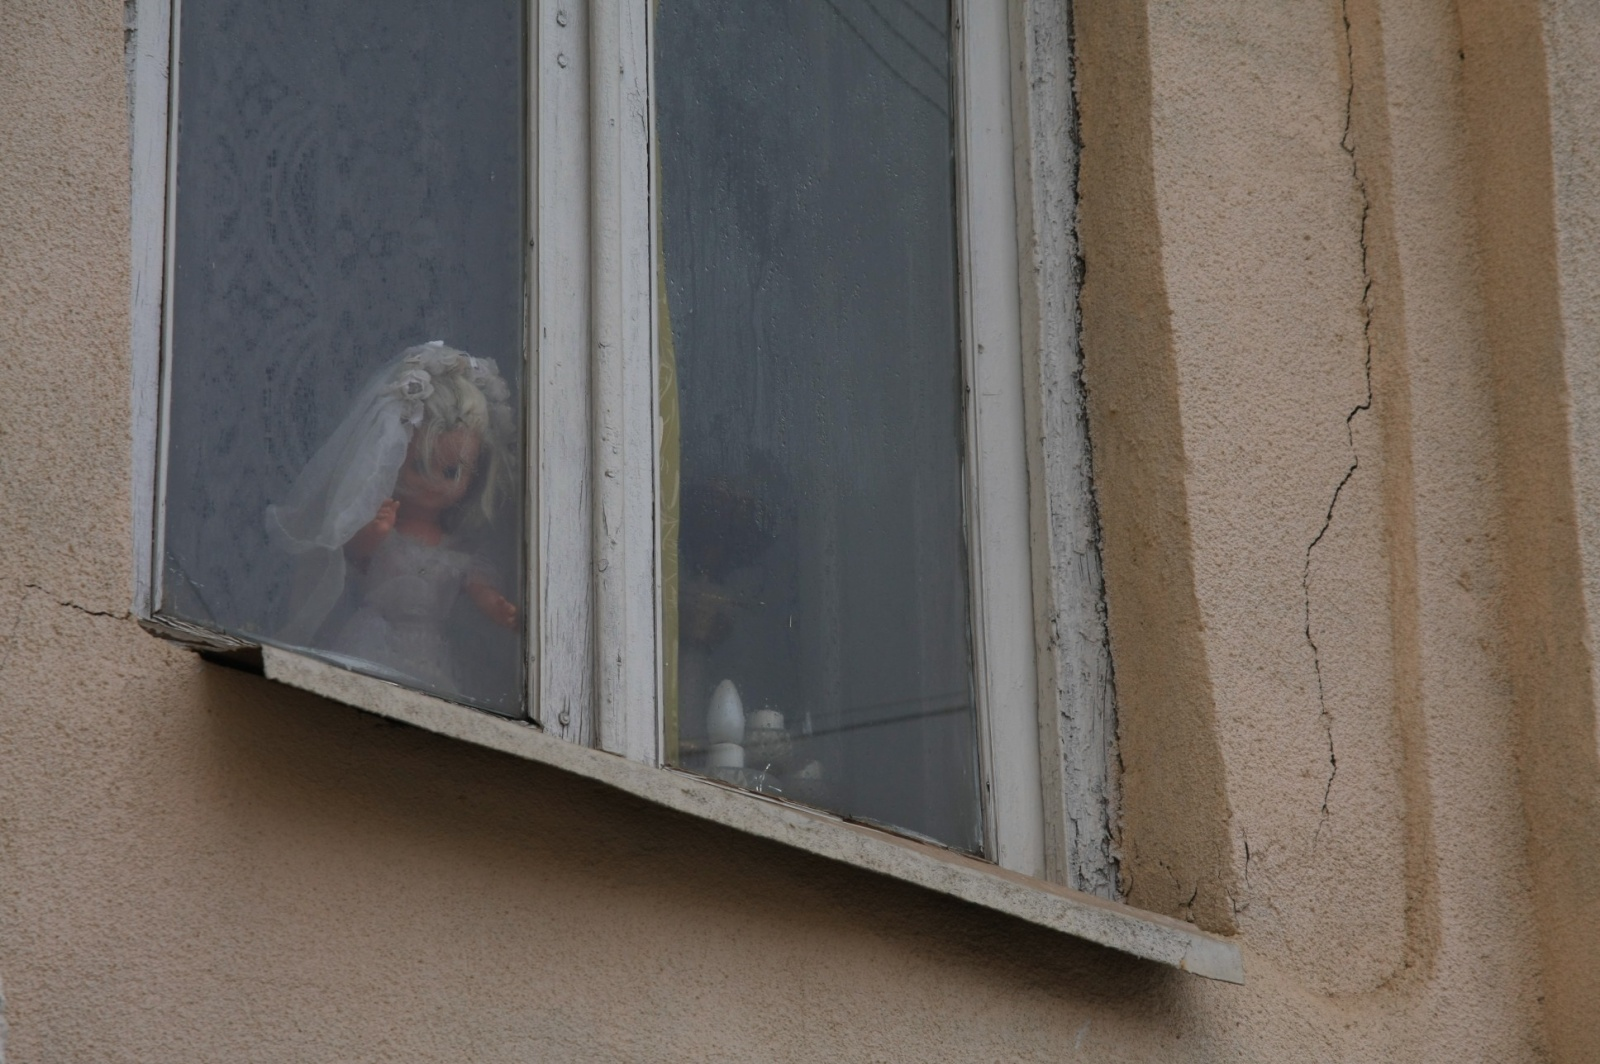 Chucky's bride watching you